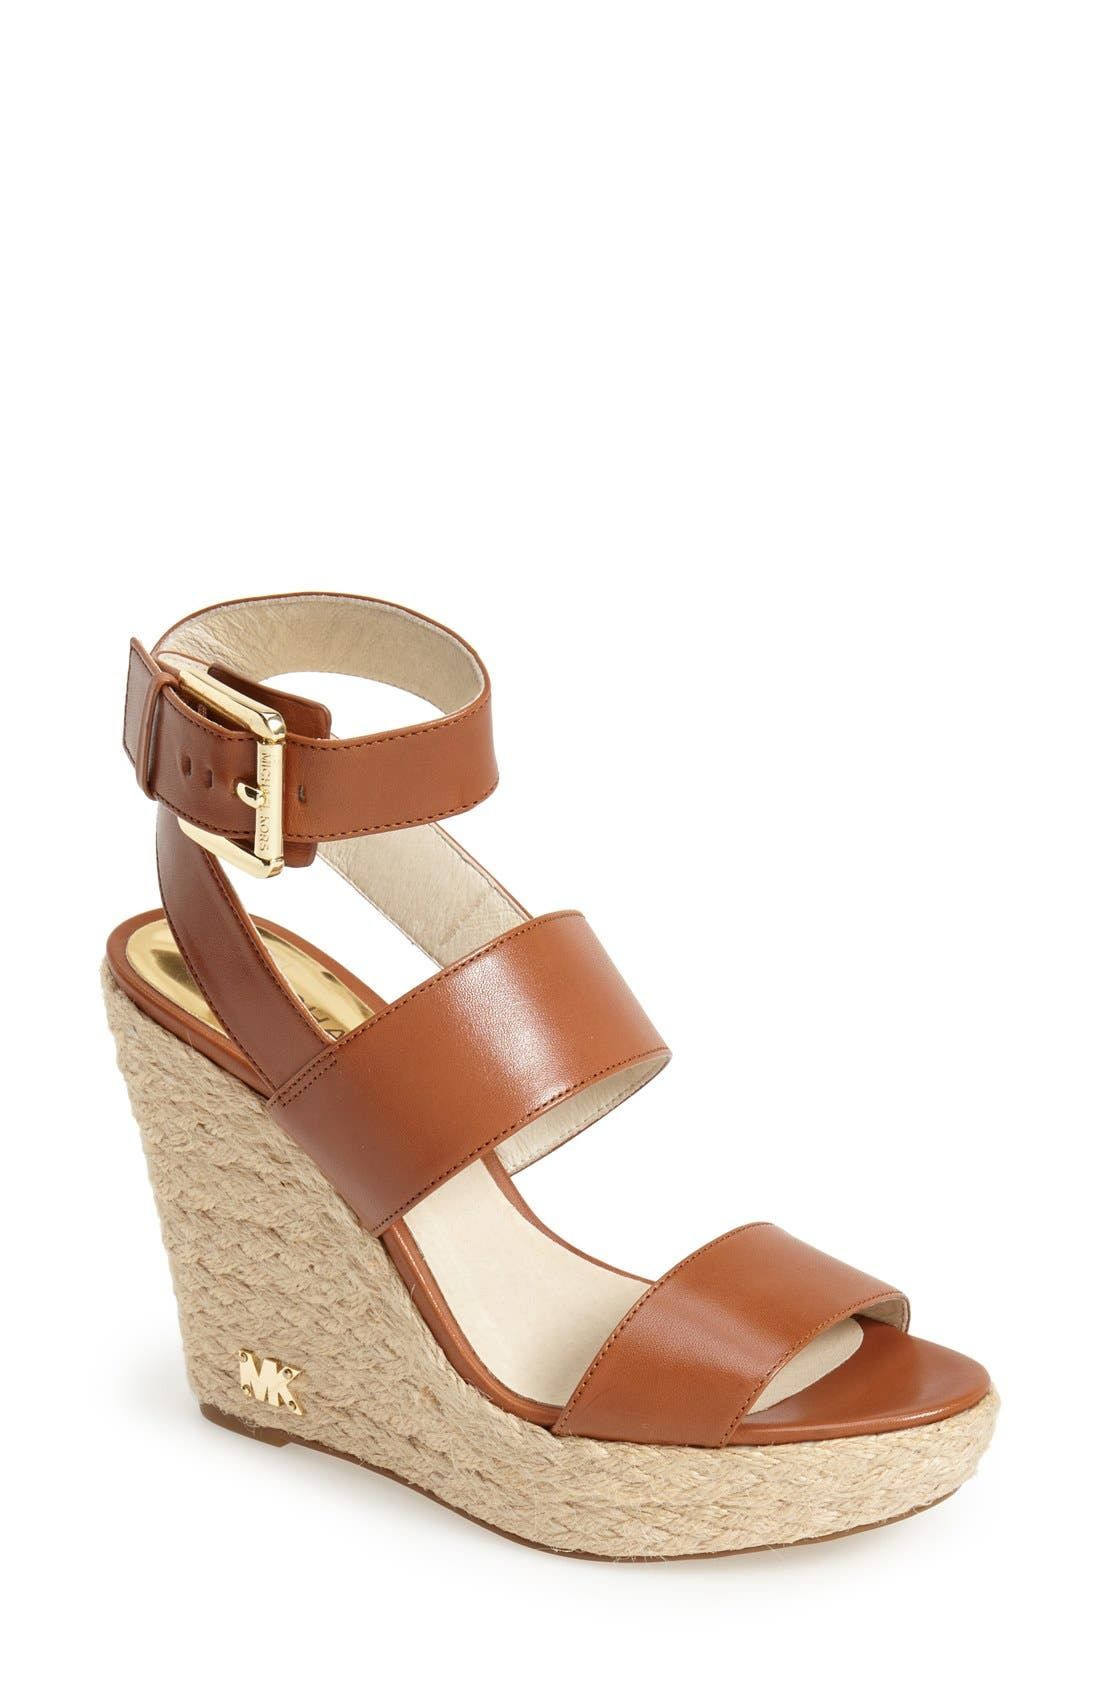 Main Image - MICHAEL Michael Kors 'Posey' Ankle Strap Espadrille Wedge Sandal (Women)